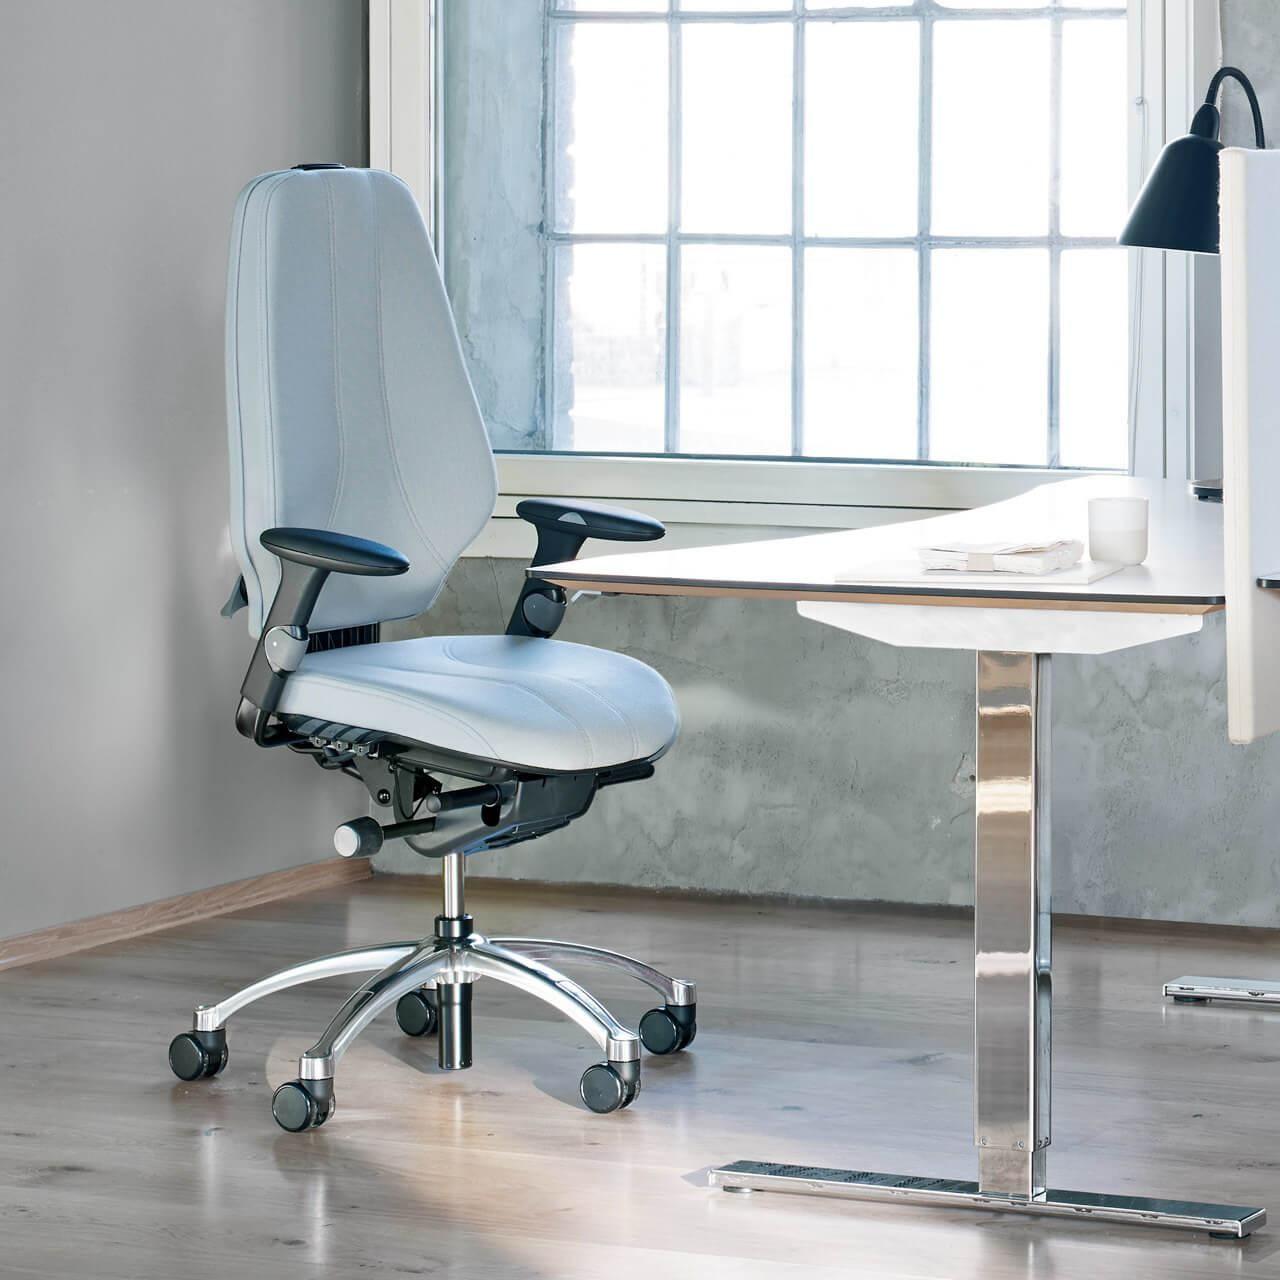 Rh logic 400 xl bureaustoel STKARHX400 0006 Omgeving 1